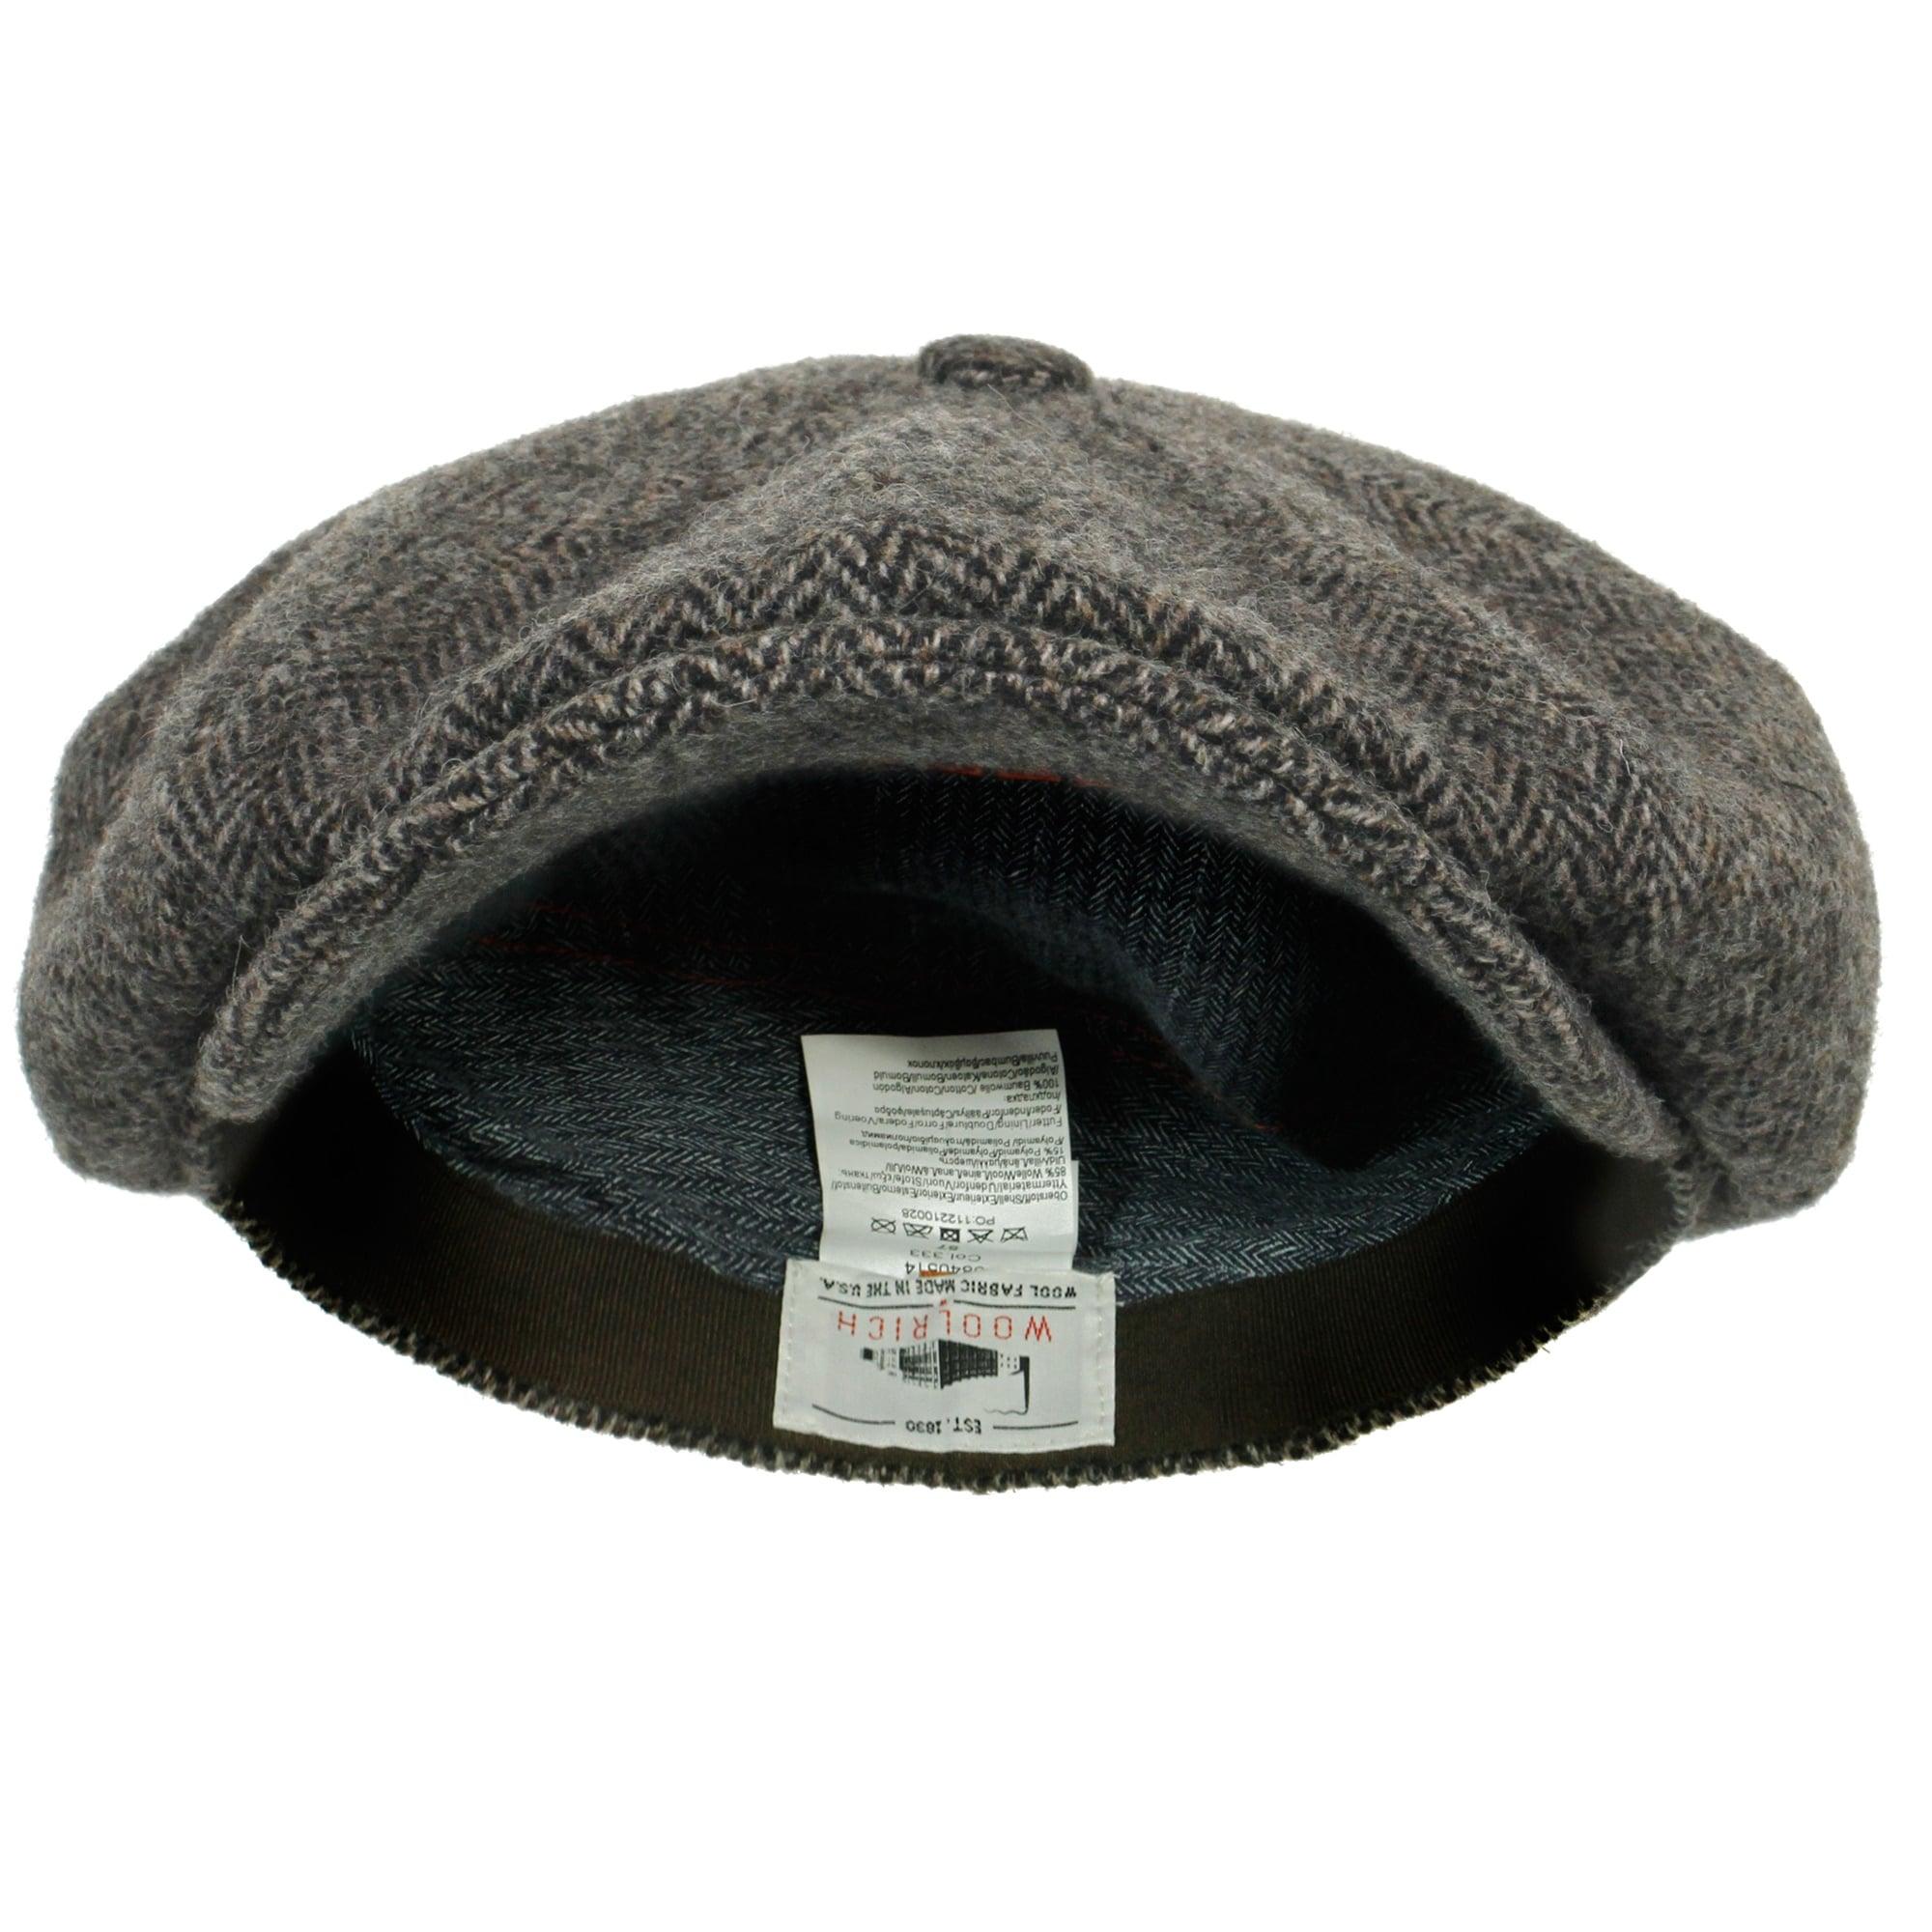 9500f44c Stetson Hatteras Woolrich Herringbone Grey Newsboy Hat 6840514 333